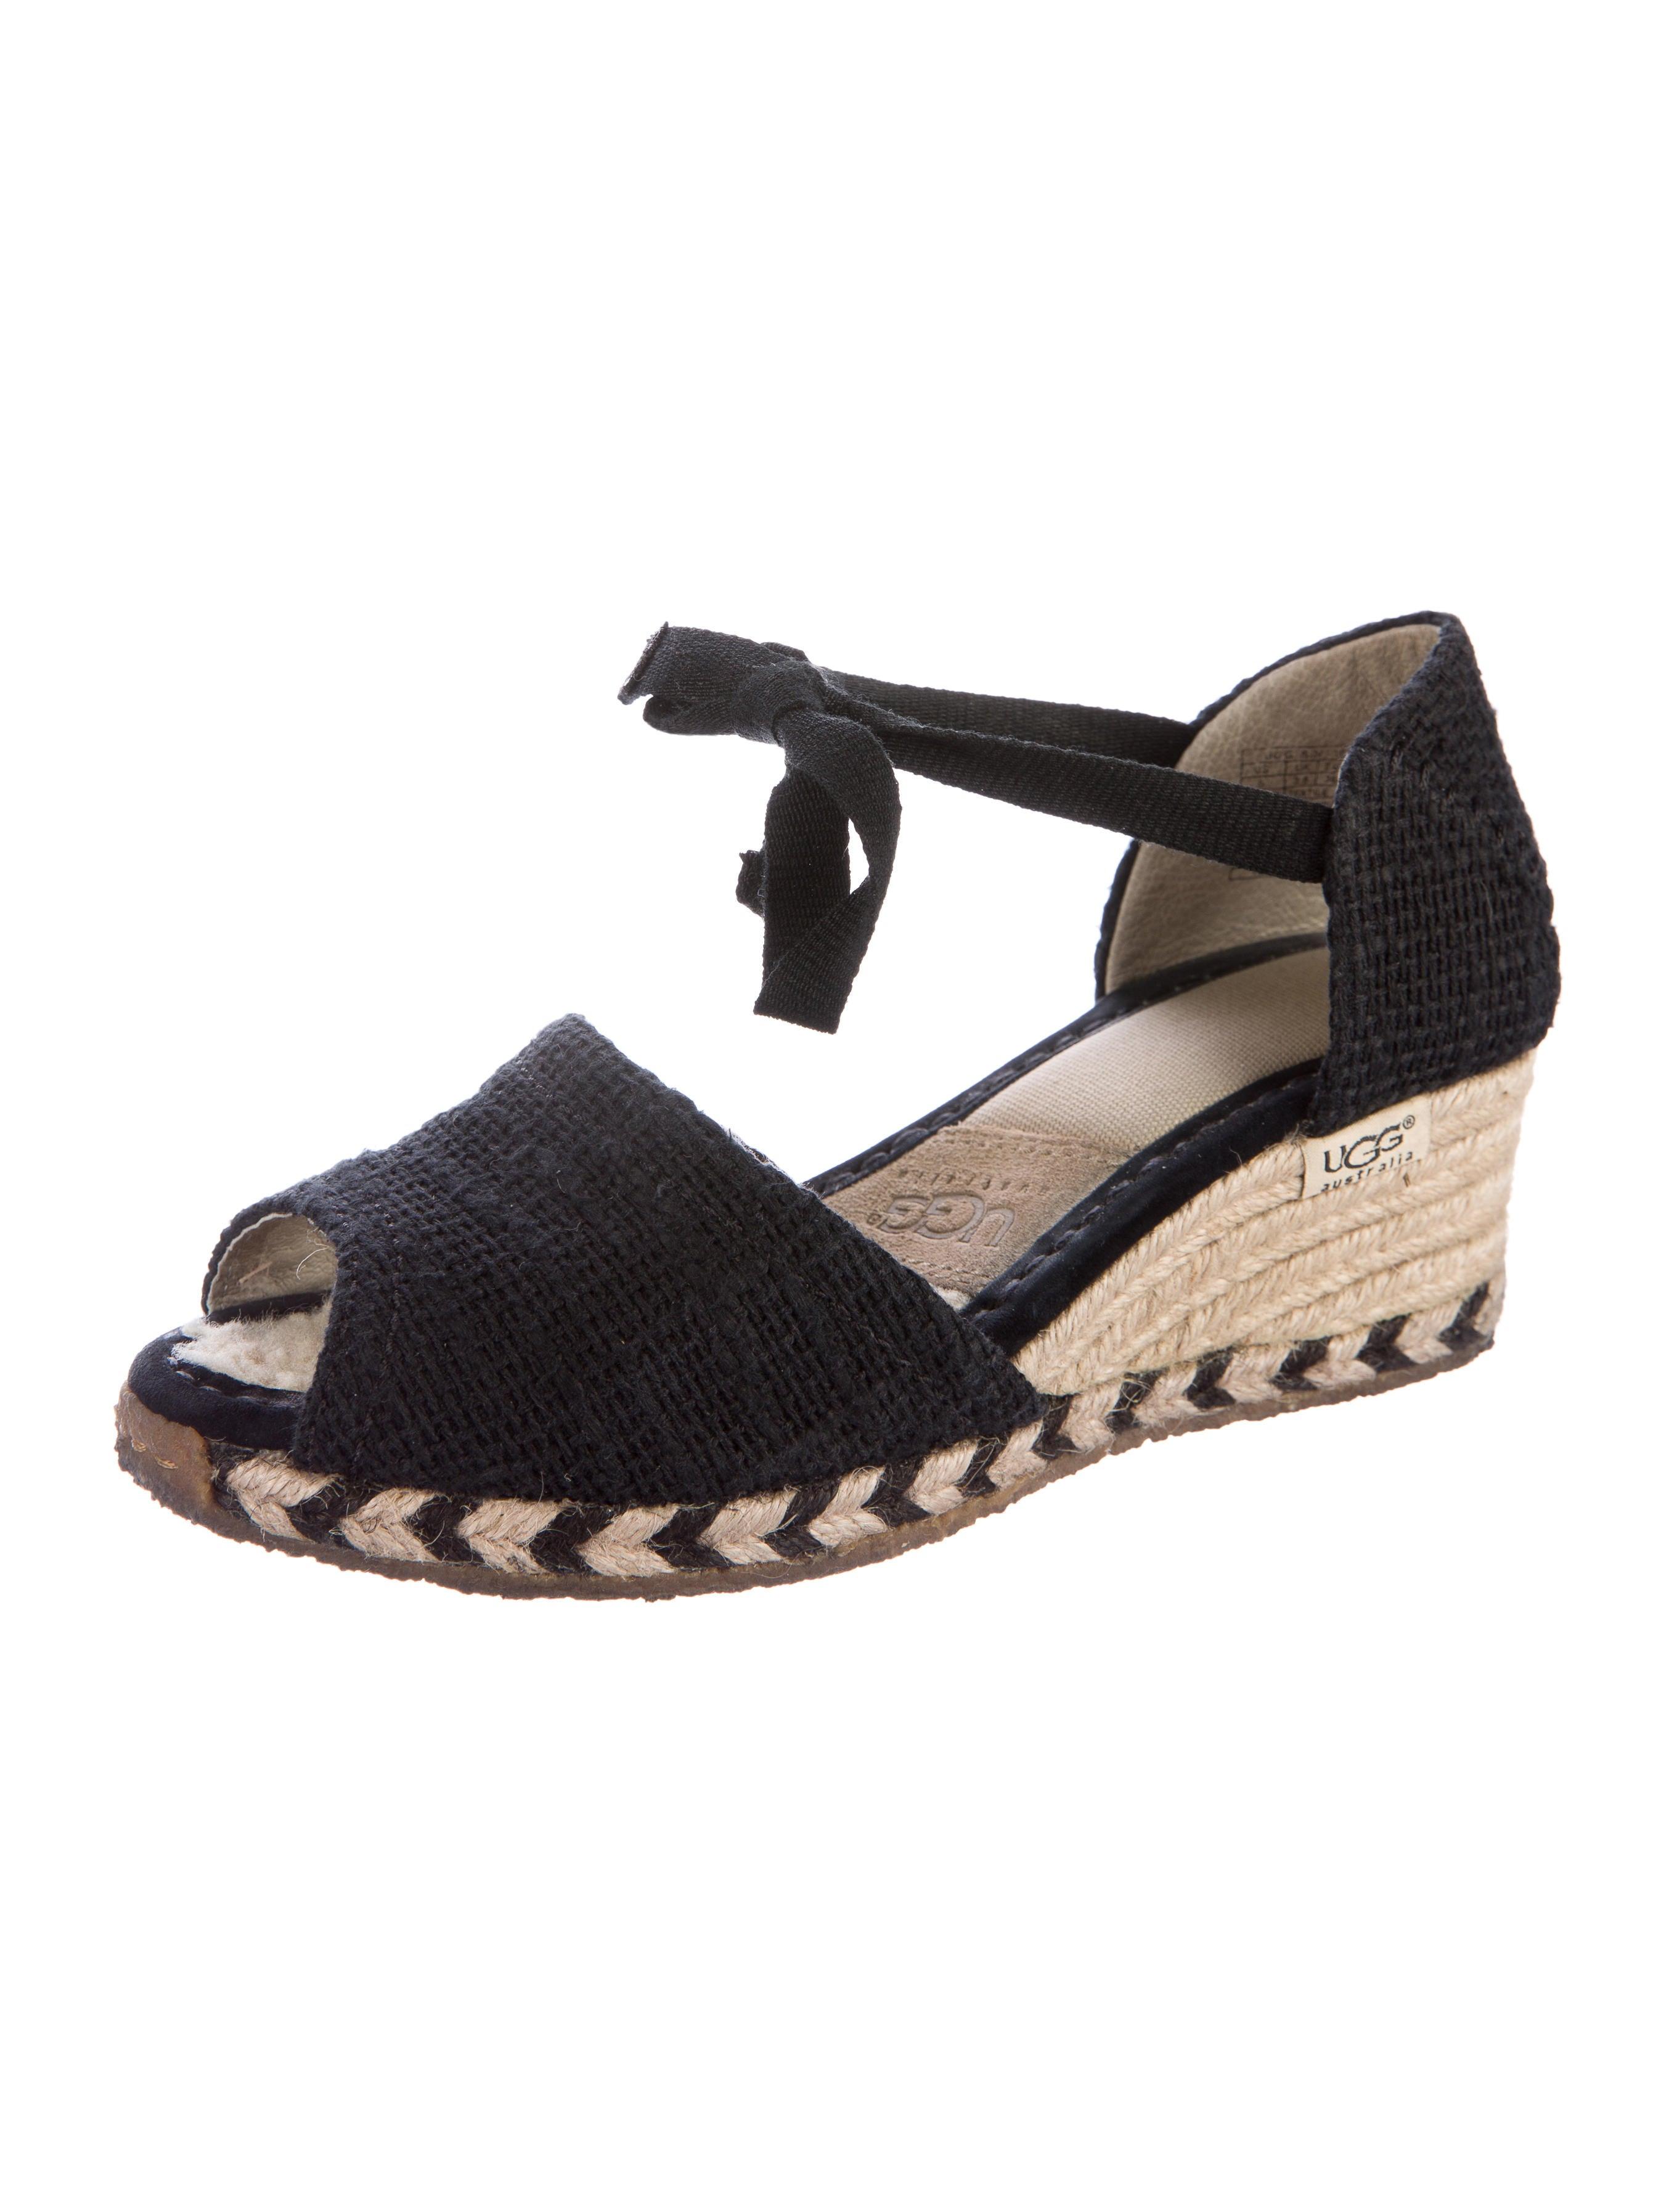 ugg australia peep toe espadrille wedges shoes